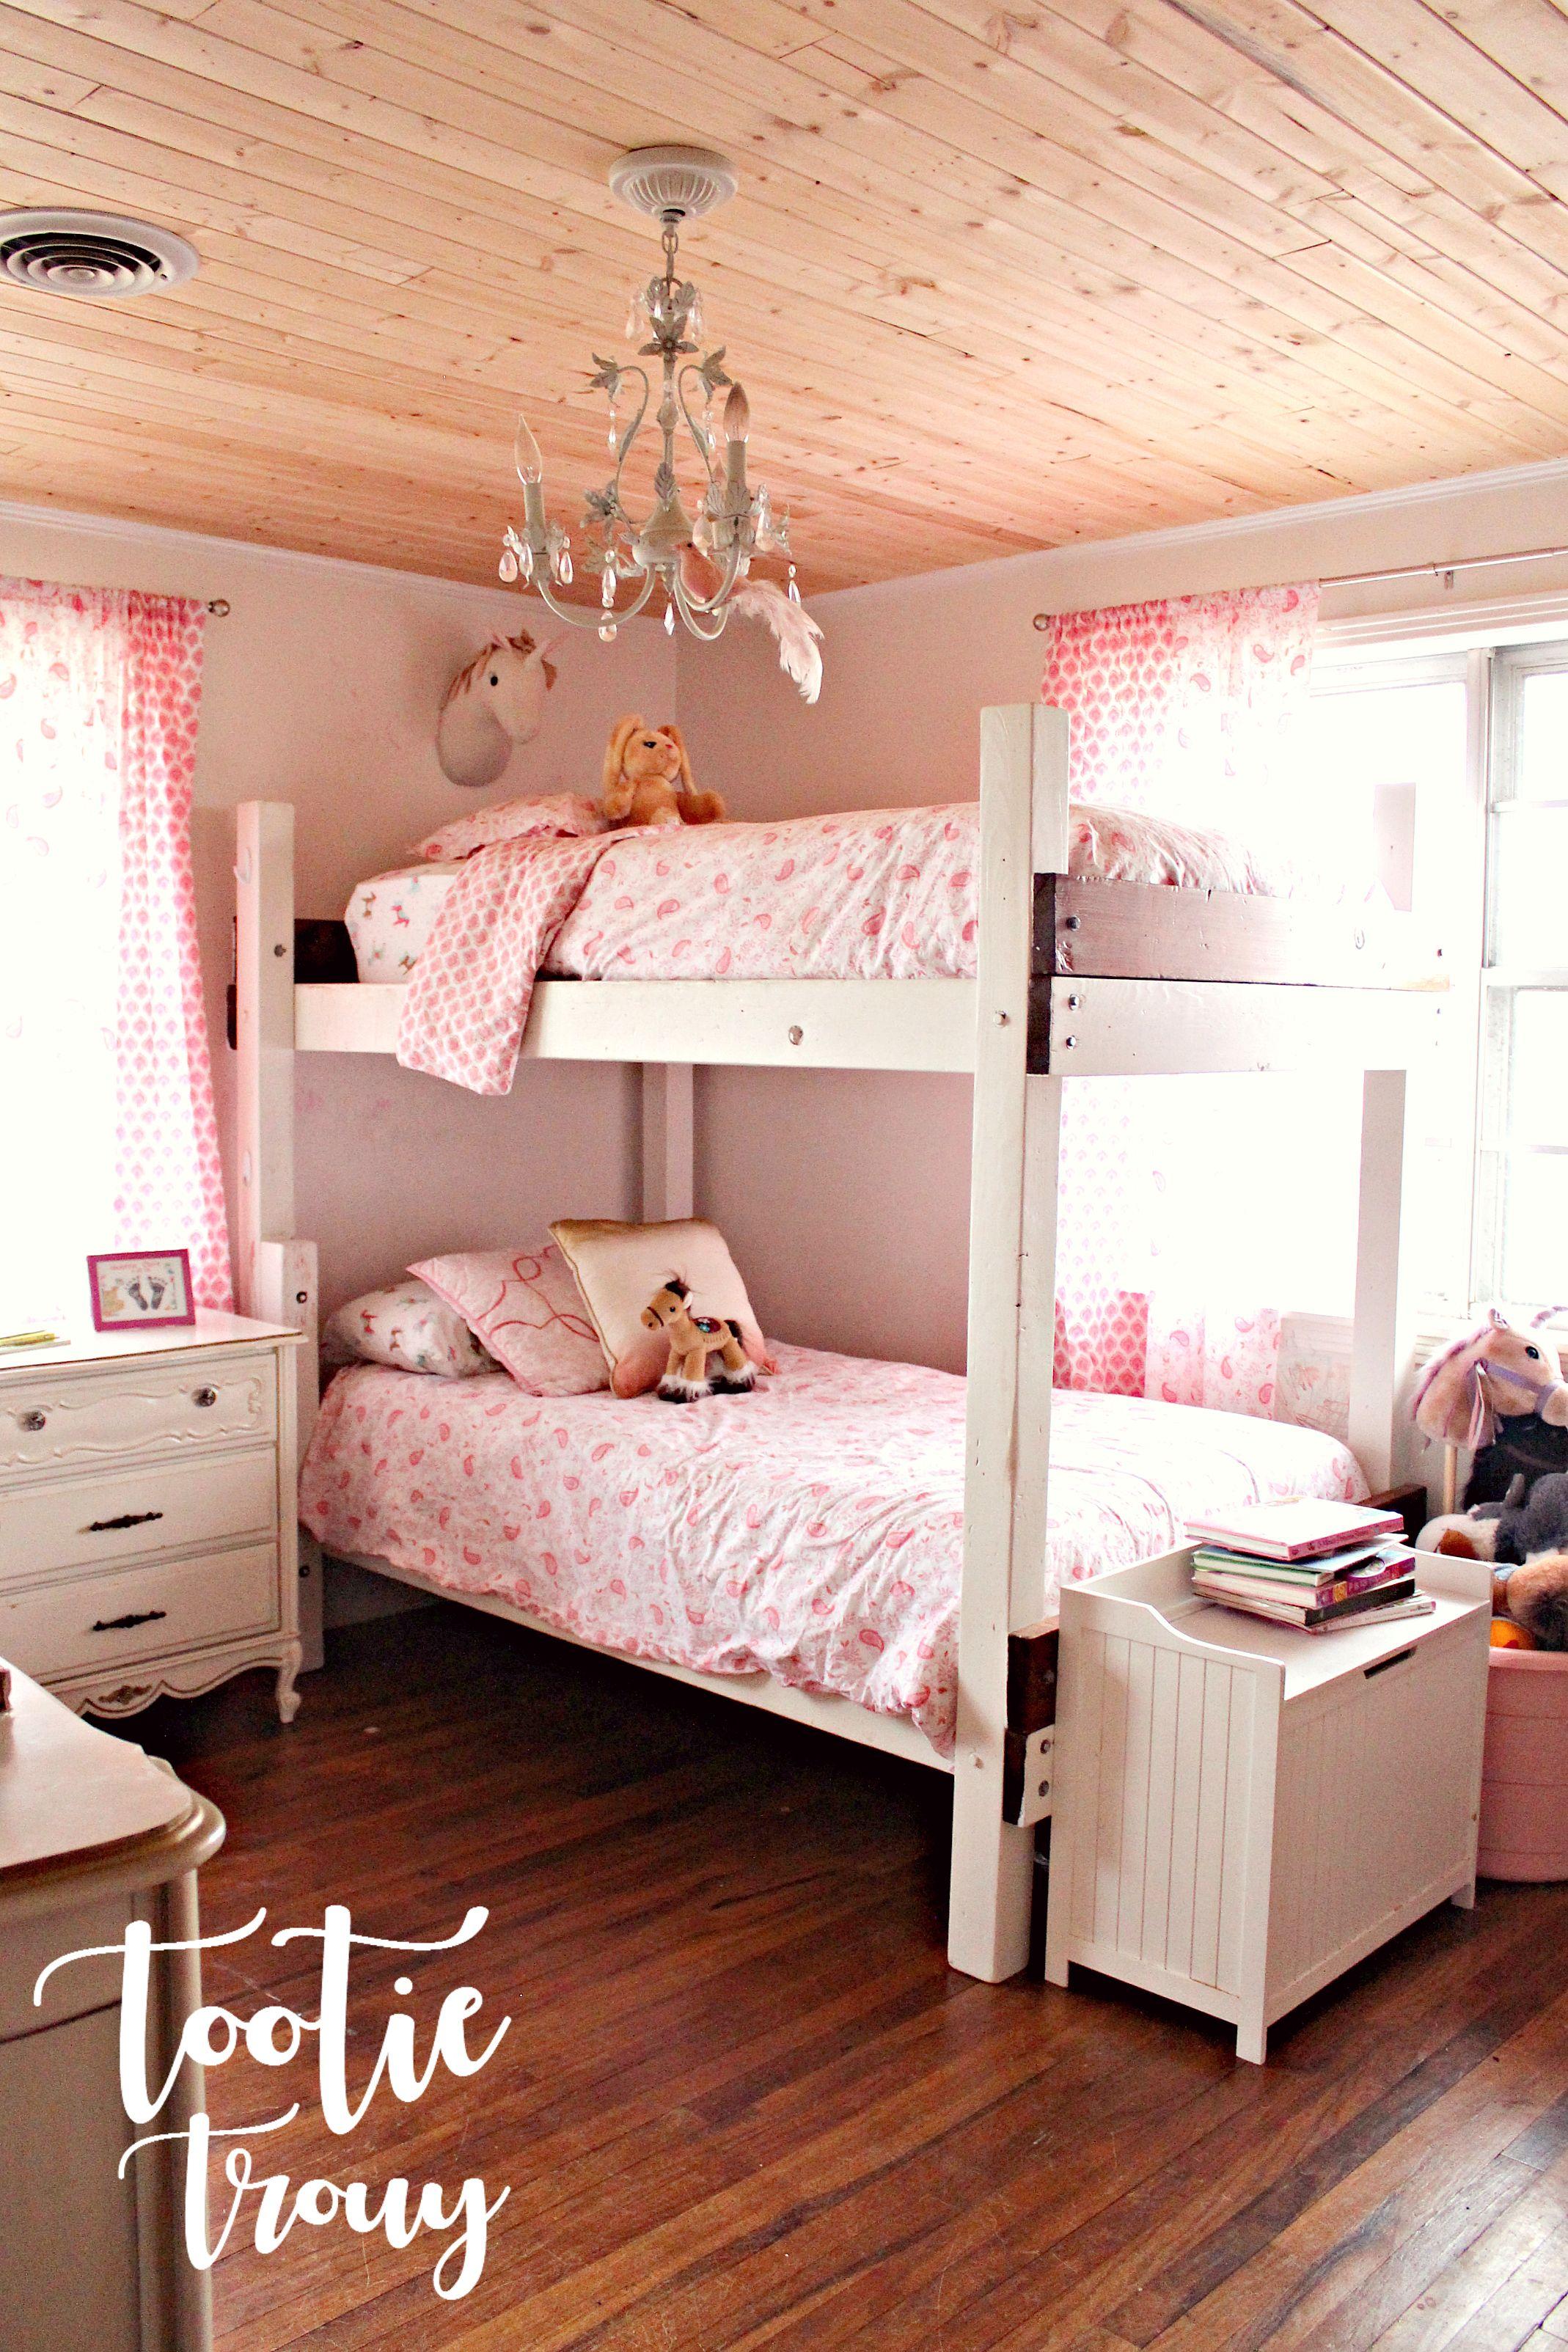 Loft bed with slide kmart  Tootie Trouy Home u Interior Design u Real Estate Bunk Bed Girls